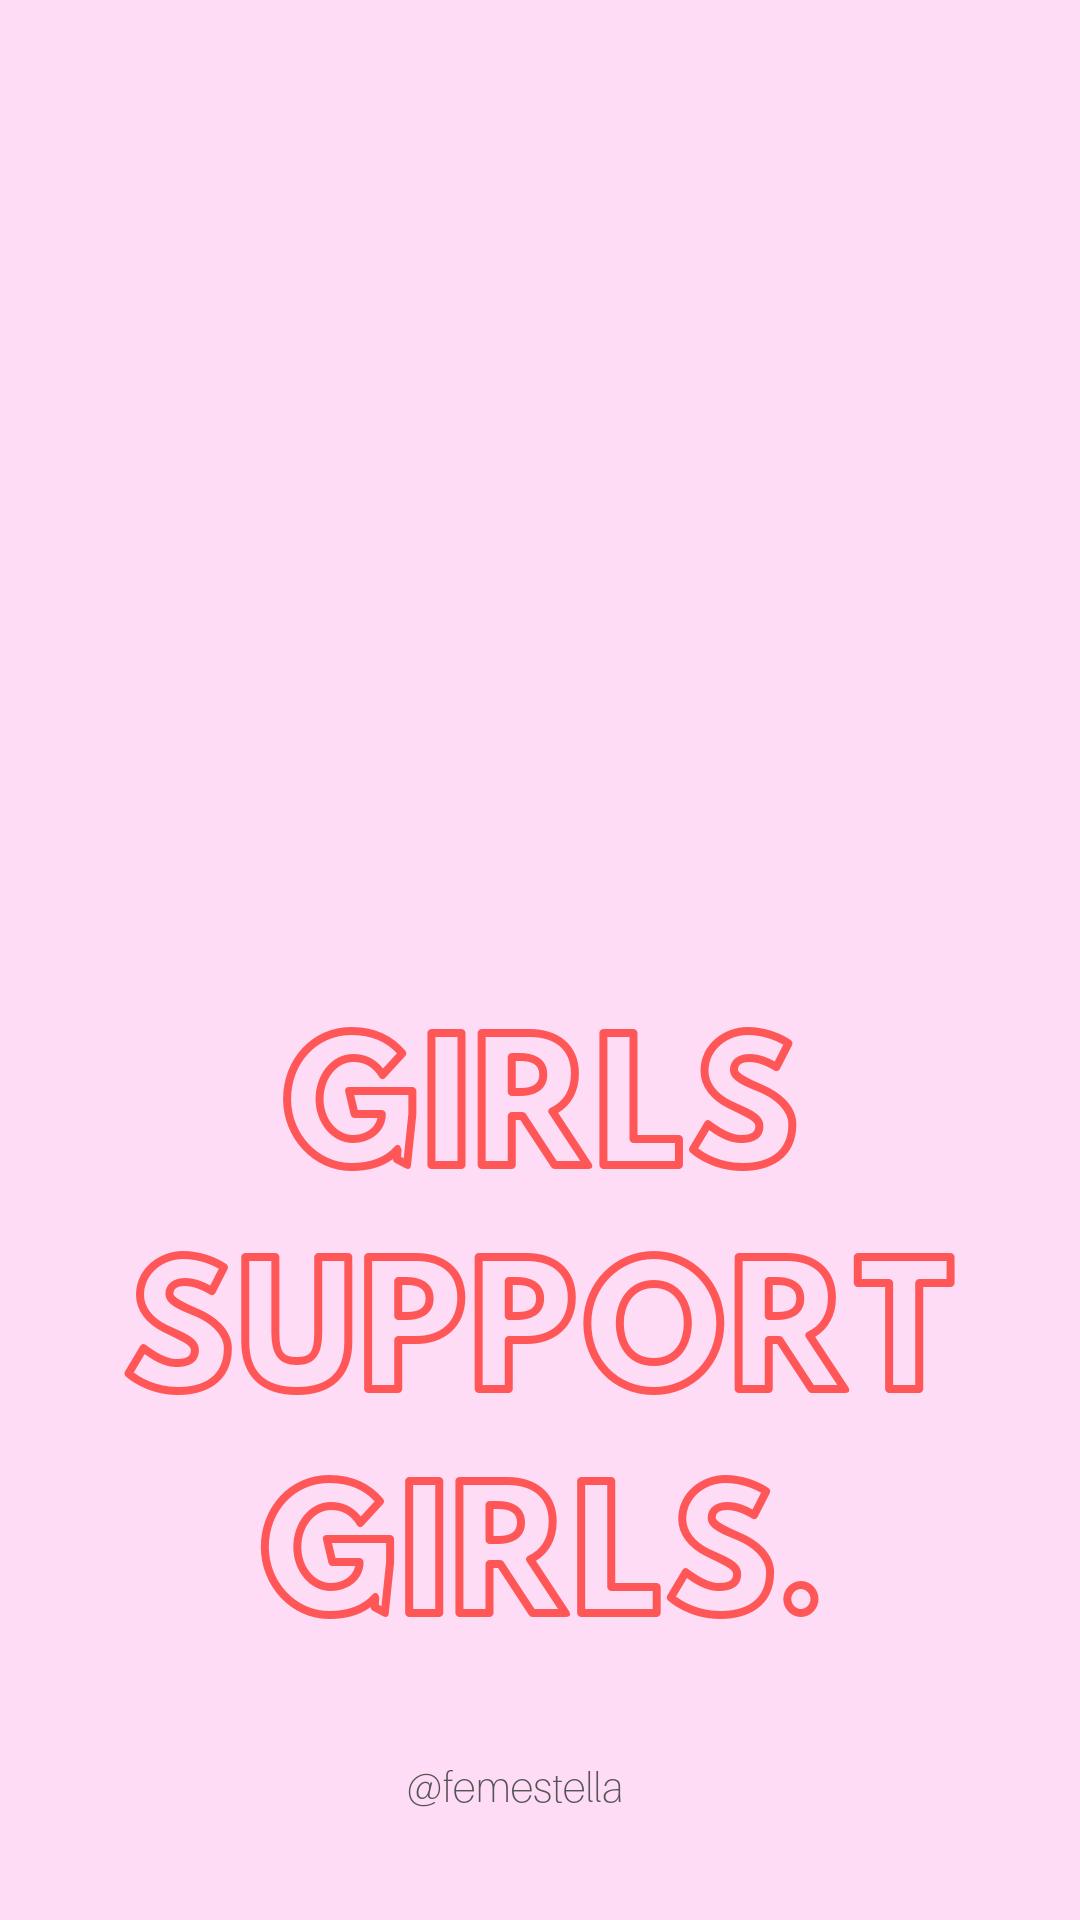 Feminist Iphone Wallpaper Power Wallpaper Girls Support Girls Funny Phone Wallpaper